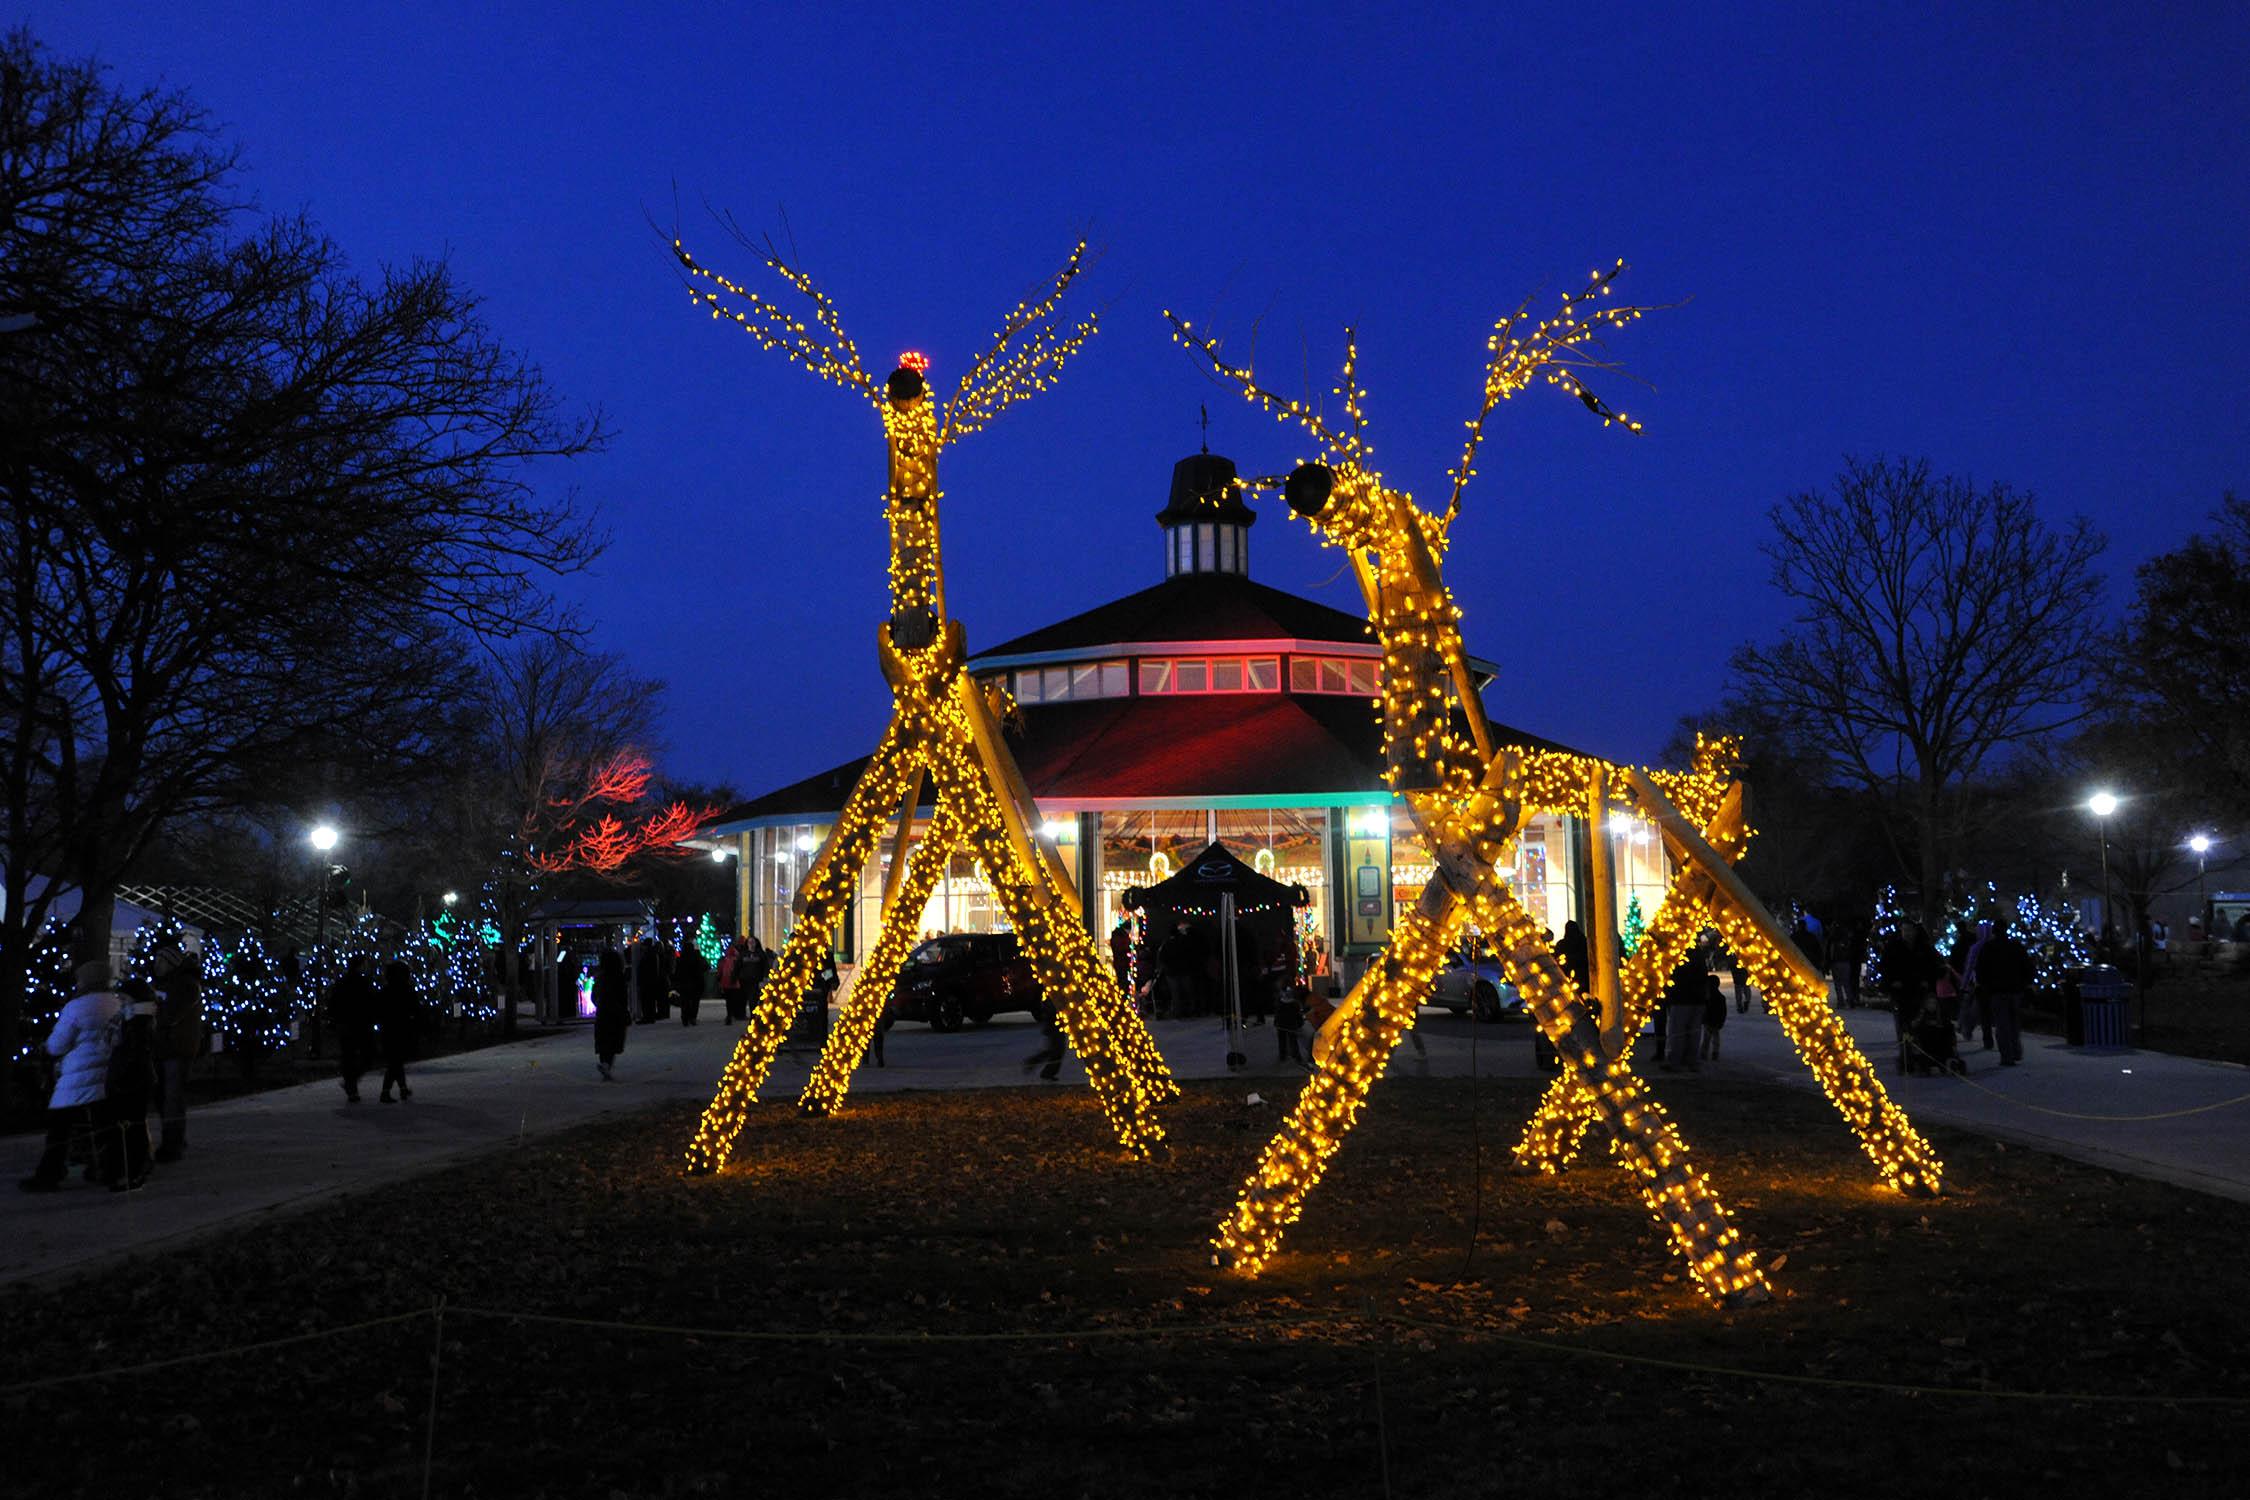 Chicago Zoological Society - Holiday Magic at Brookfield Zoo